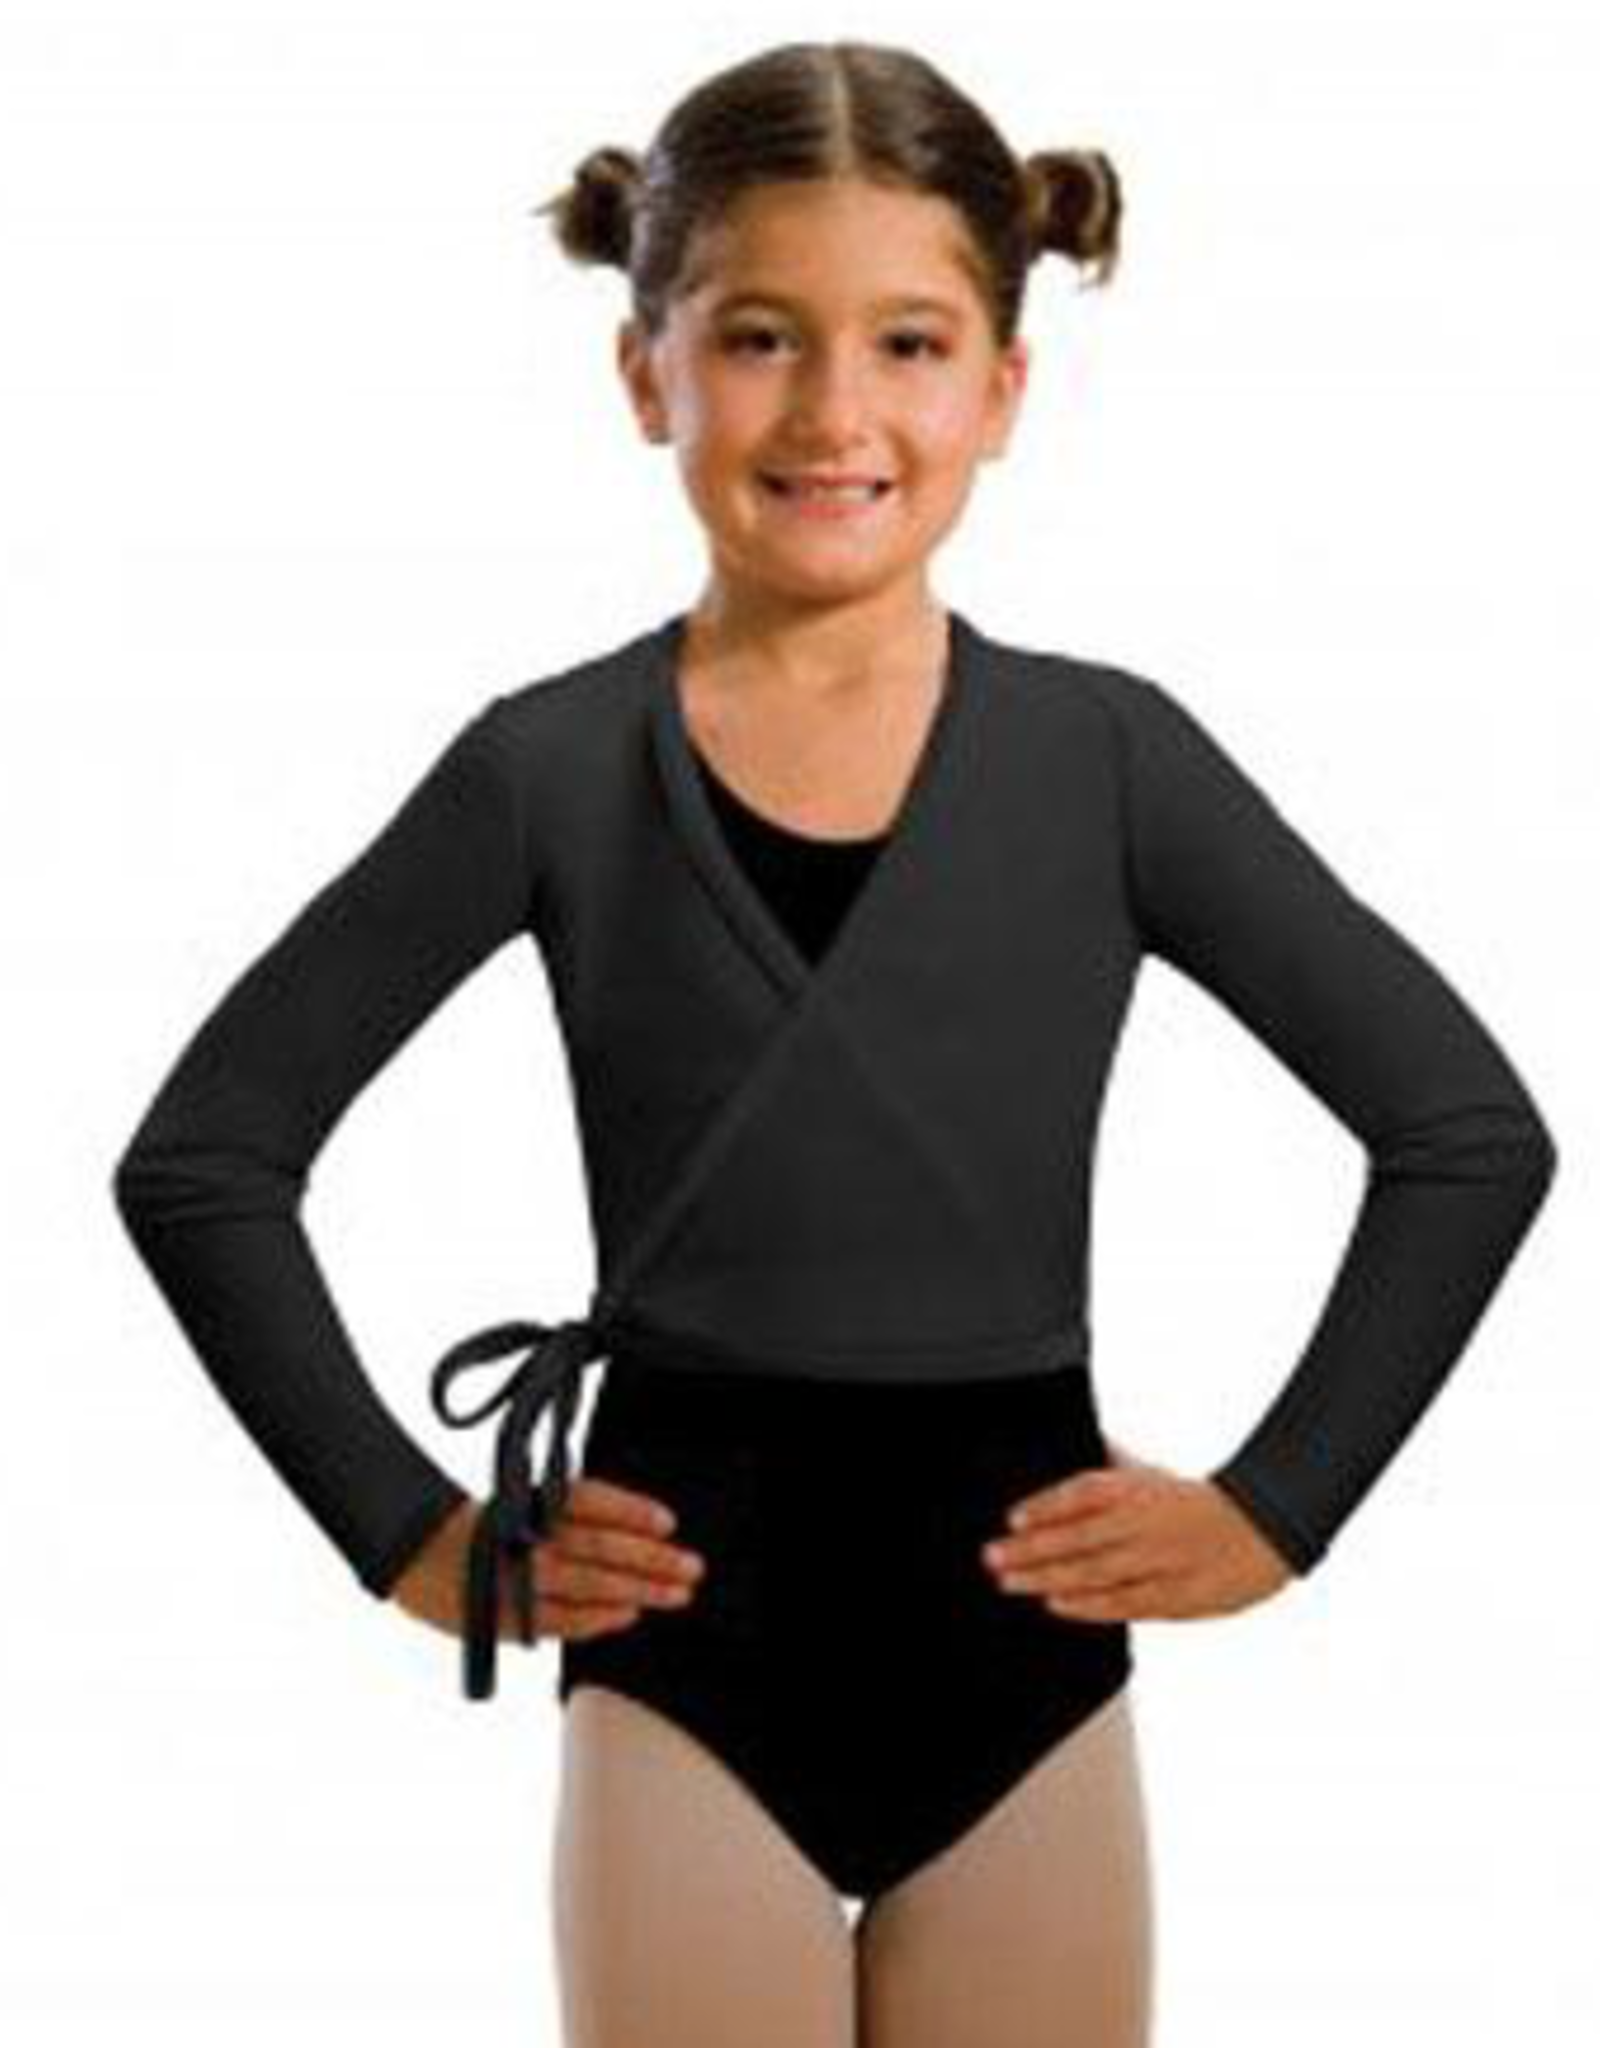 MOTIONWEAR CHILD DANCE WRAP SWEATER (3109C)